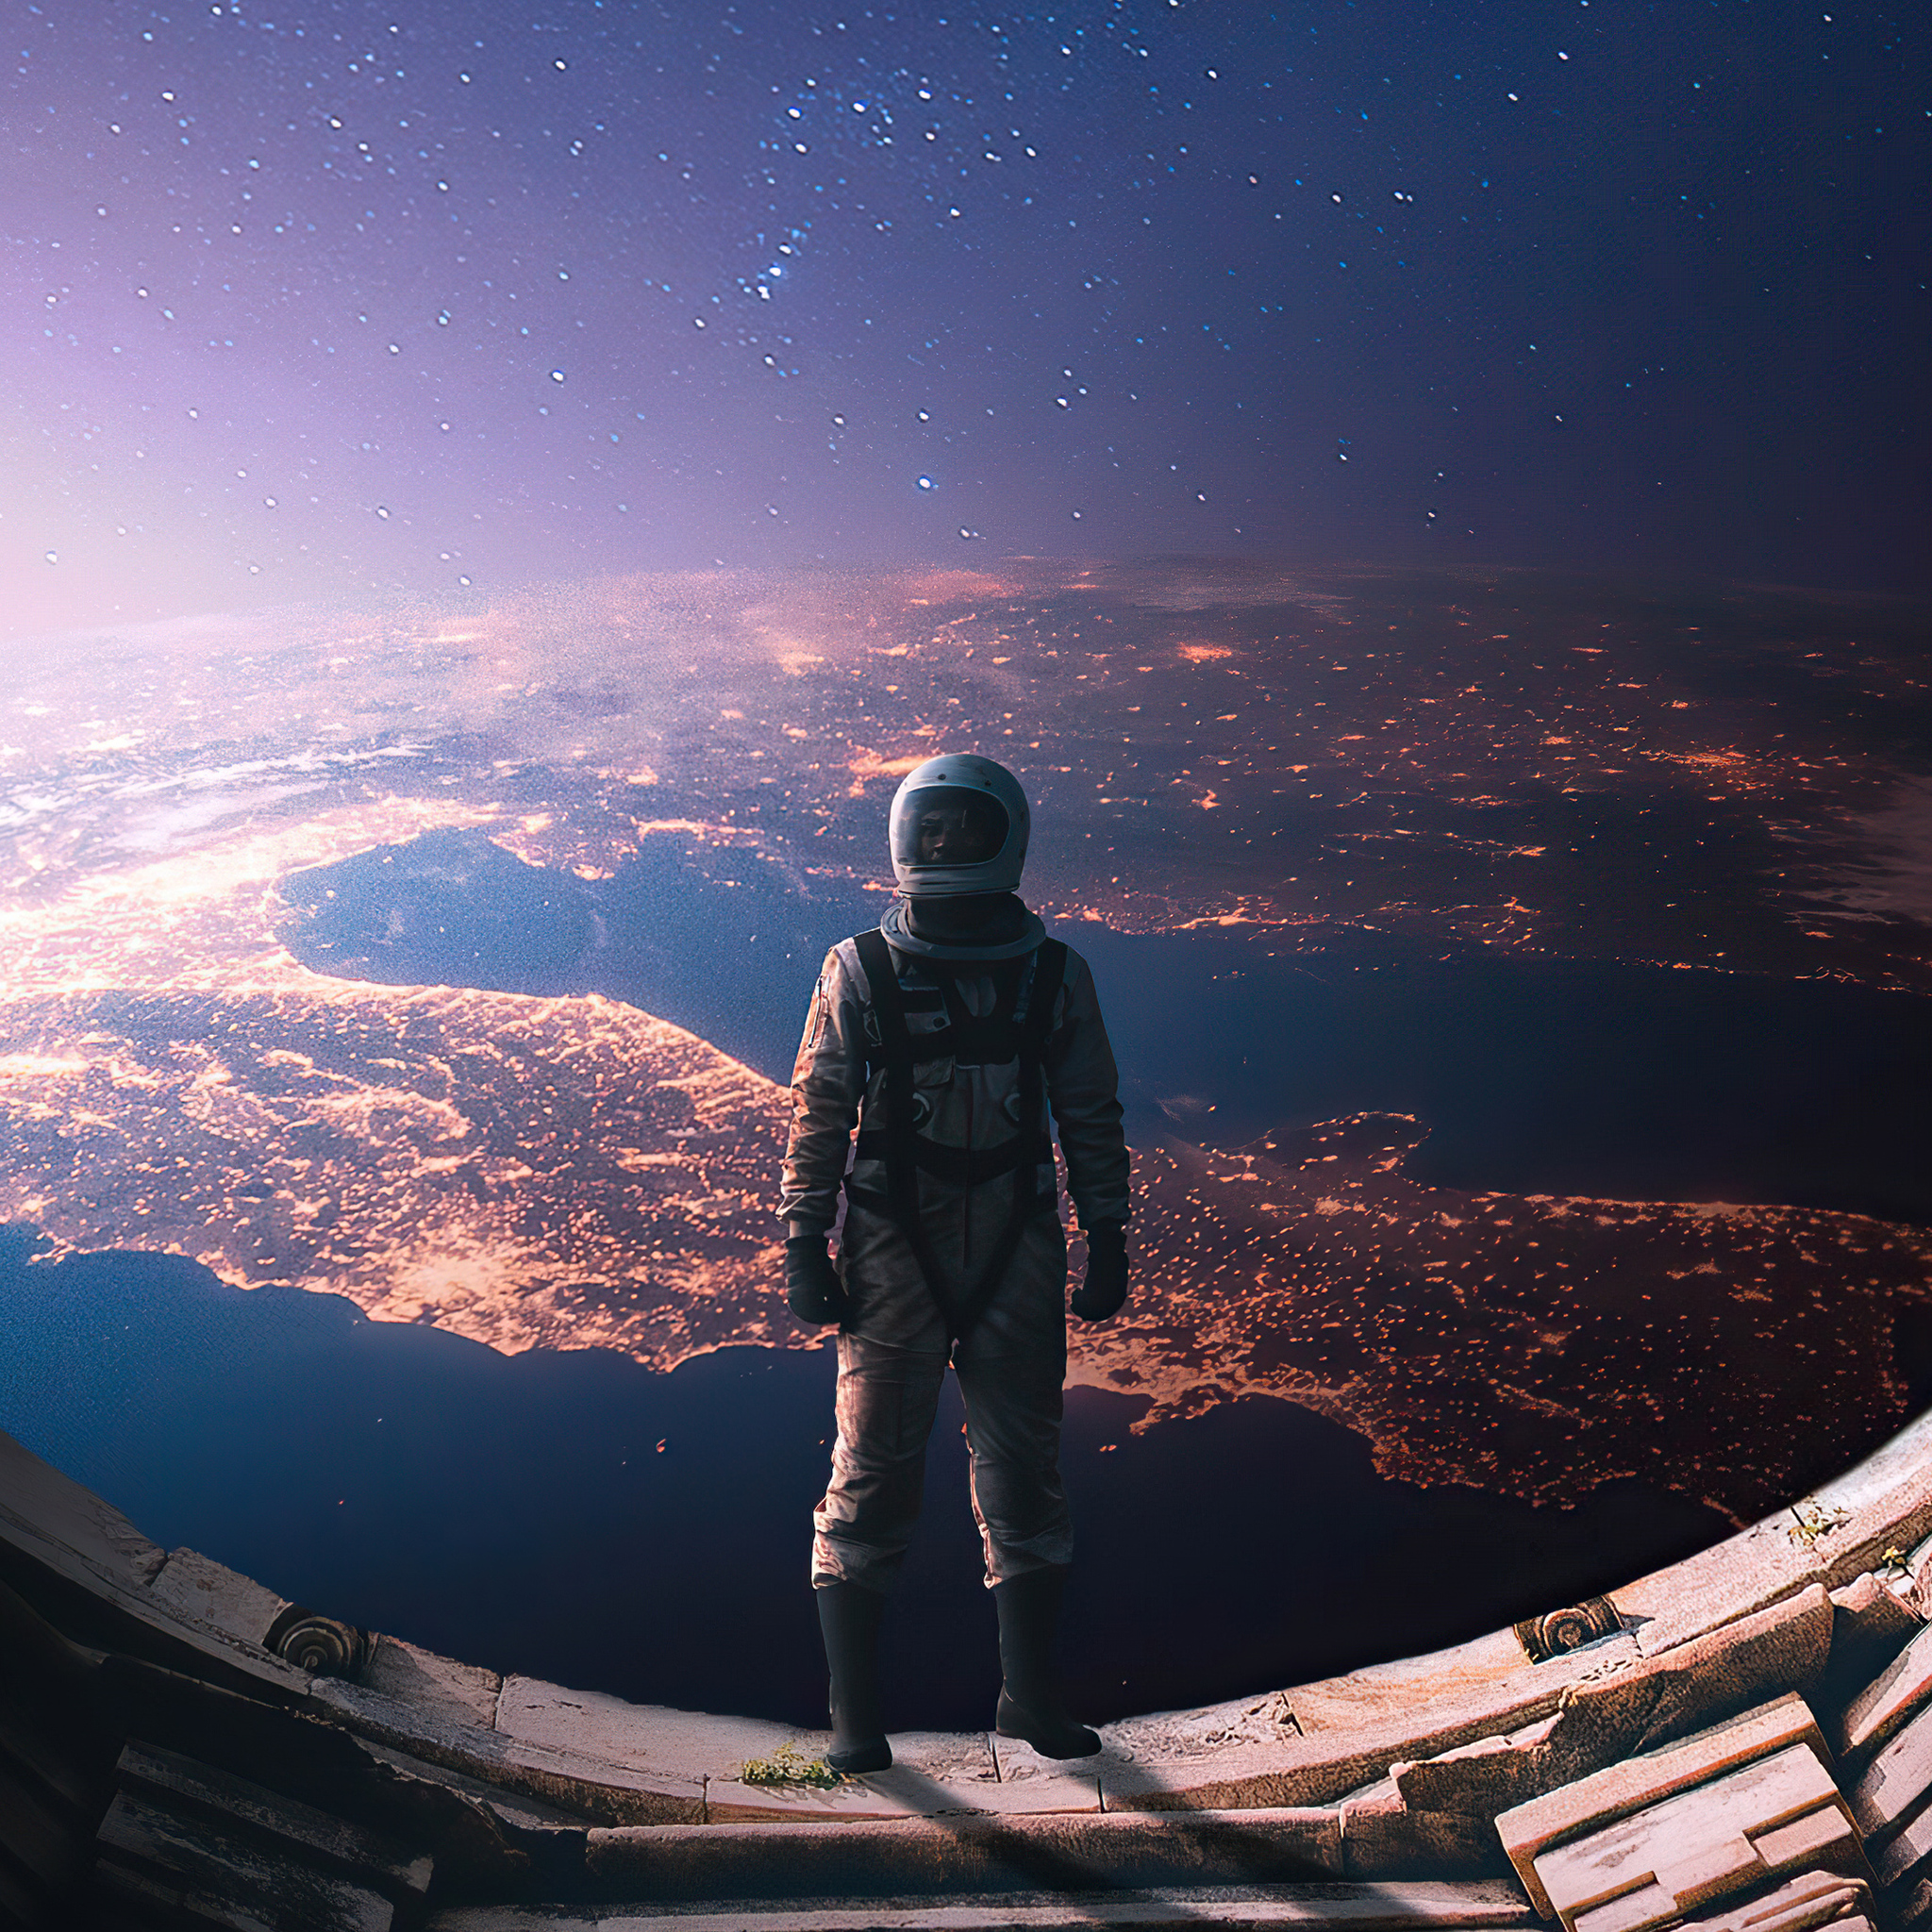 interstellar-astronaut-4k-yr.jpg